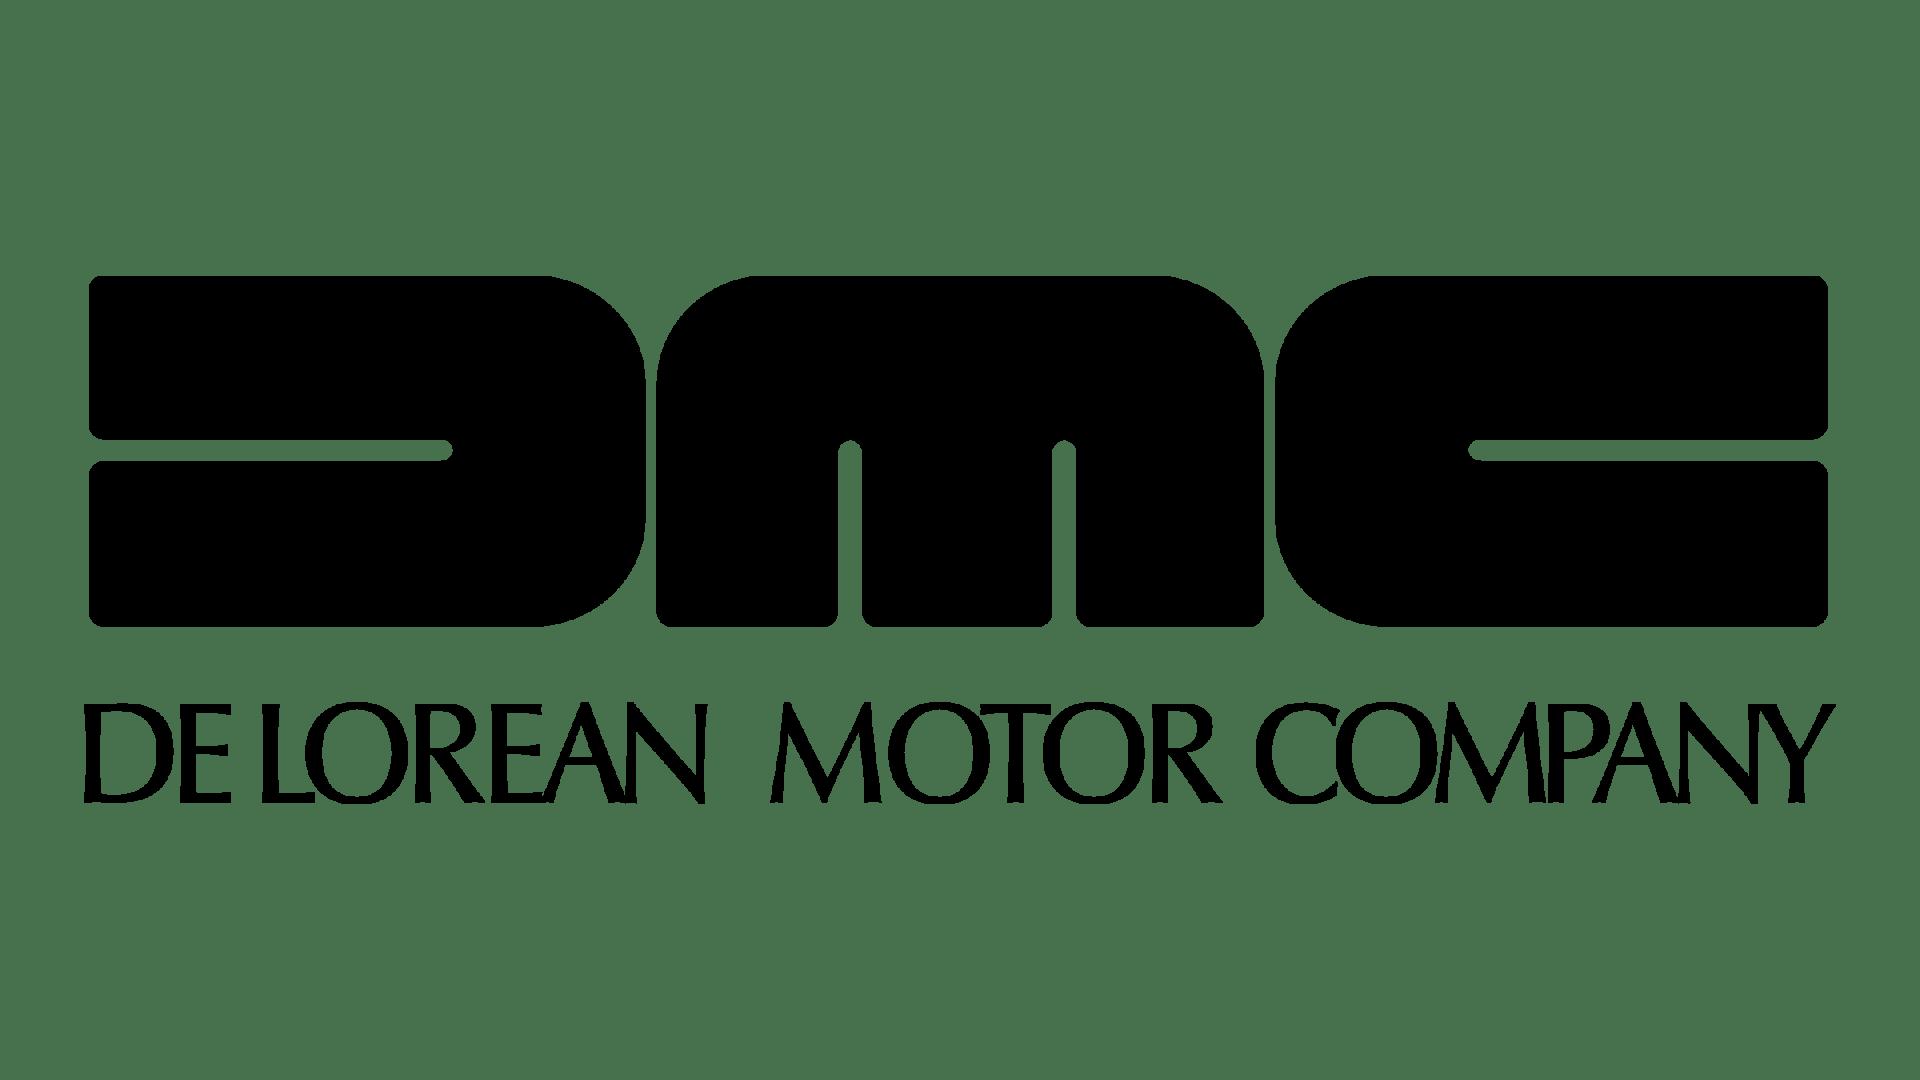 Логотип DMC (DeLorean Motor Company)